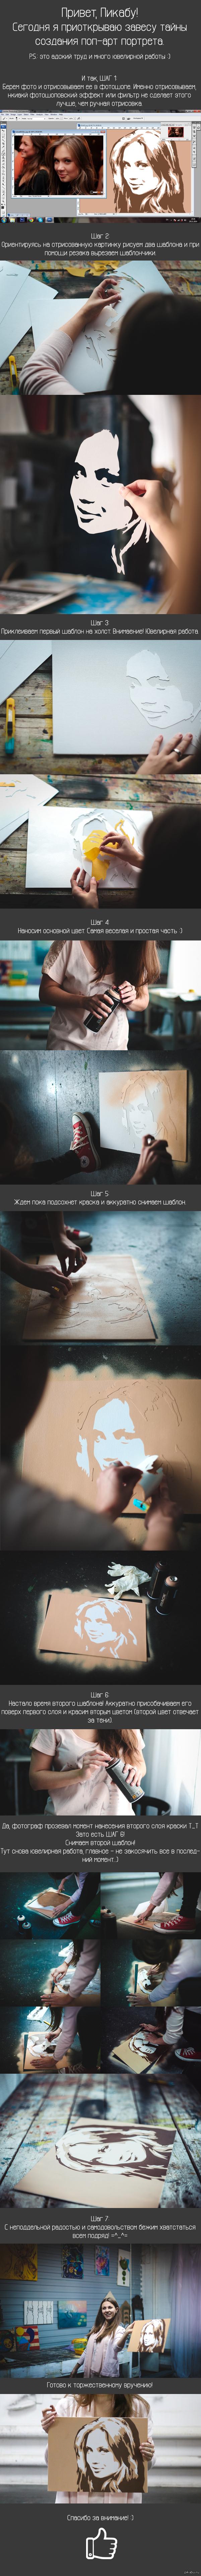 http://s4.pikabu.ru/post_img/2014/11/30/6/1417334536_1880807218.jpg